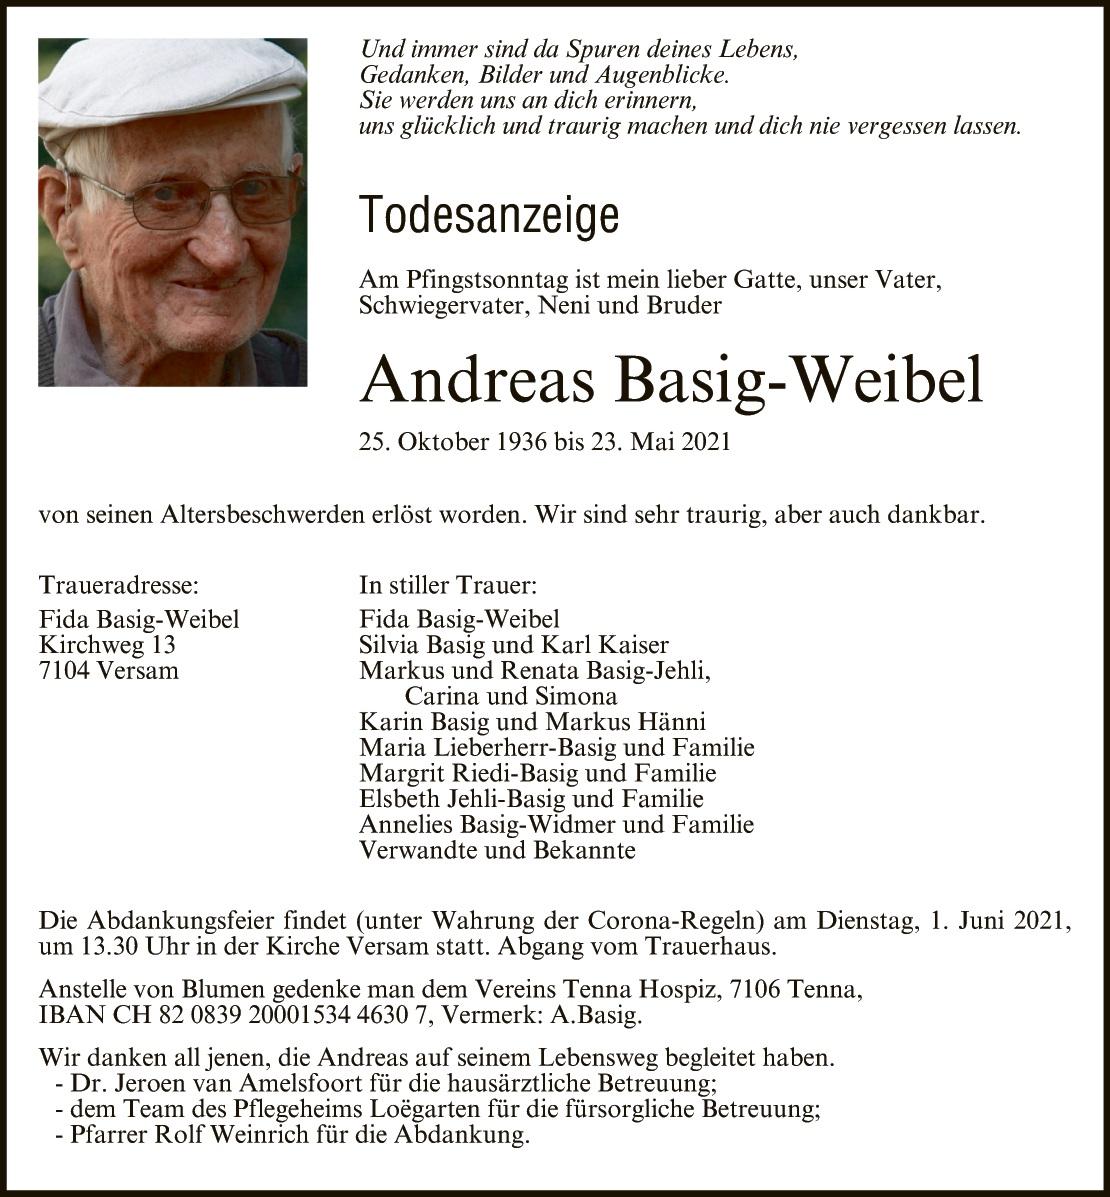 Andreas Basig-Weibel